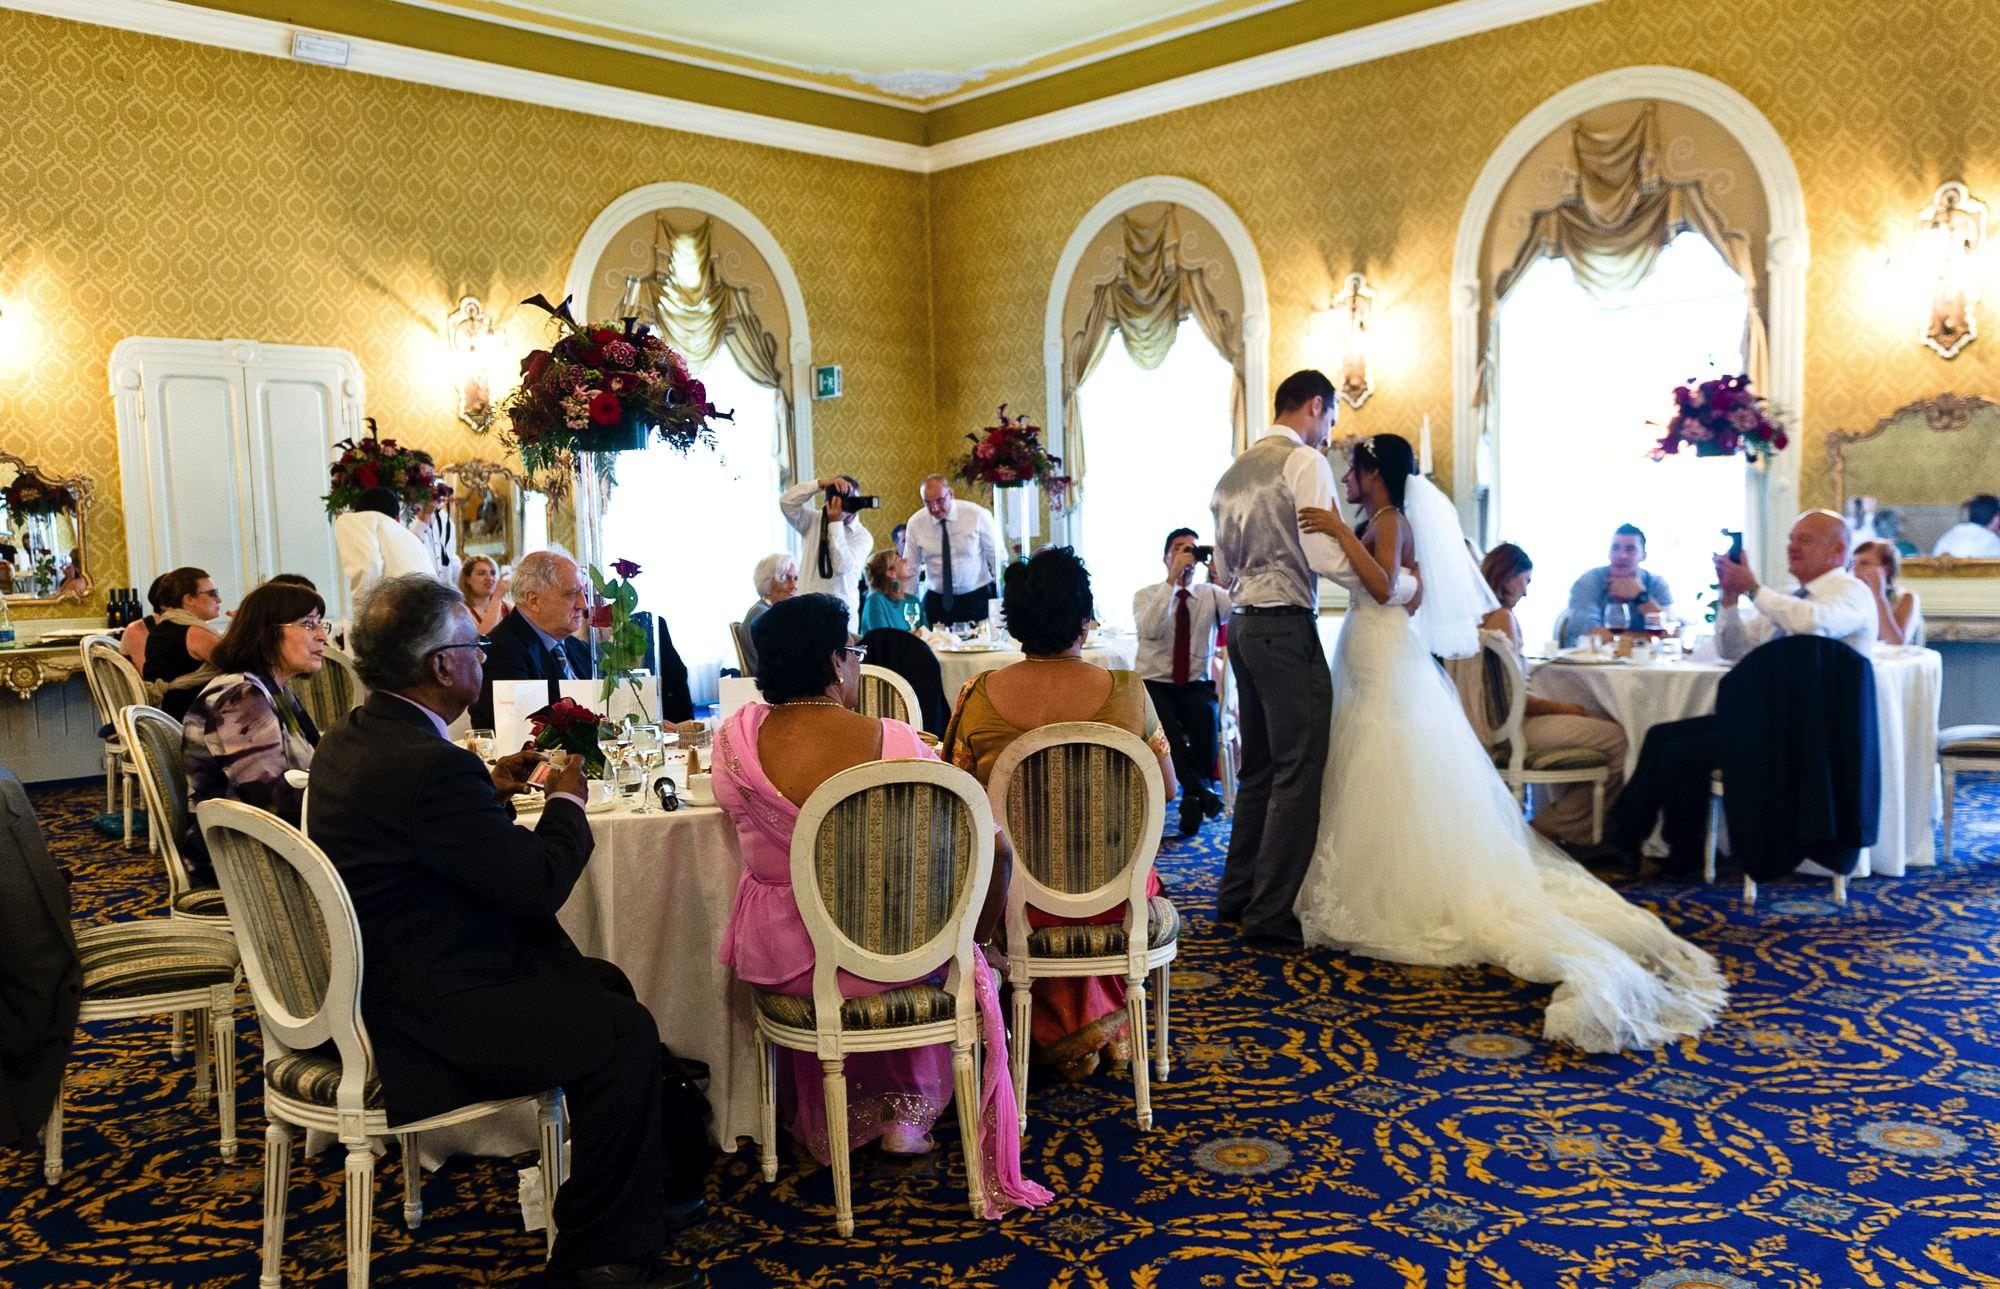 Grand Hotel Tremezzo Wedding Luxury Hotels Lake Como